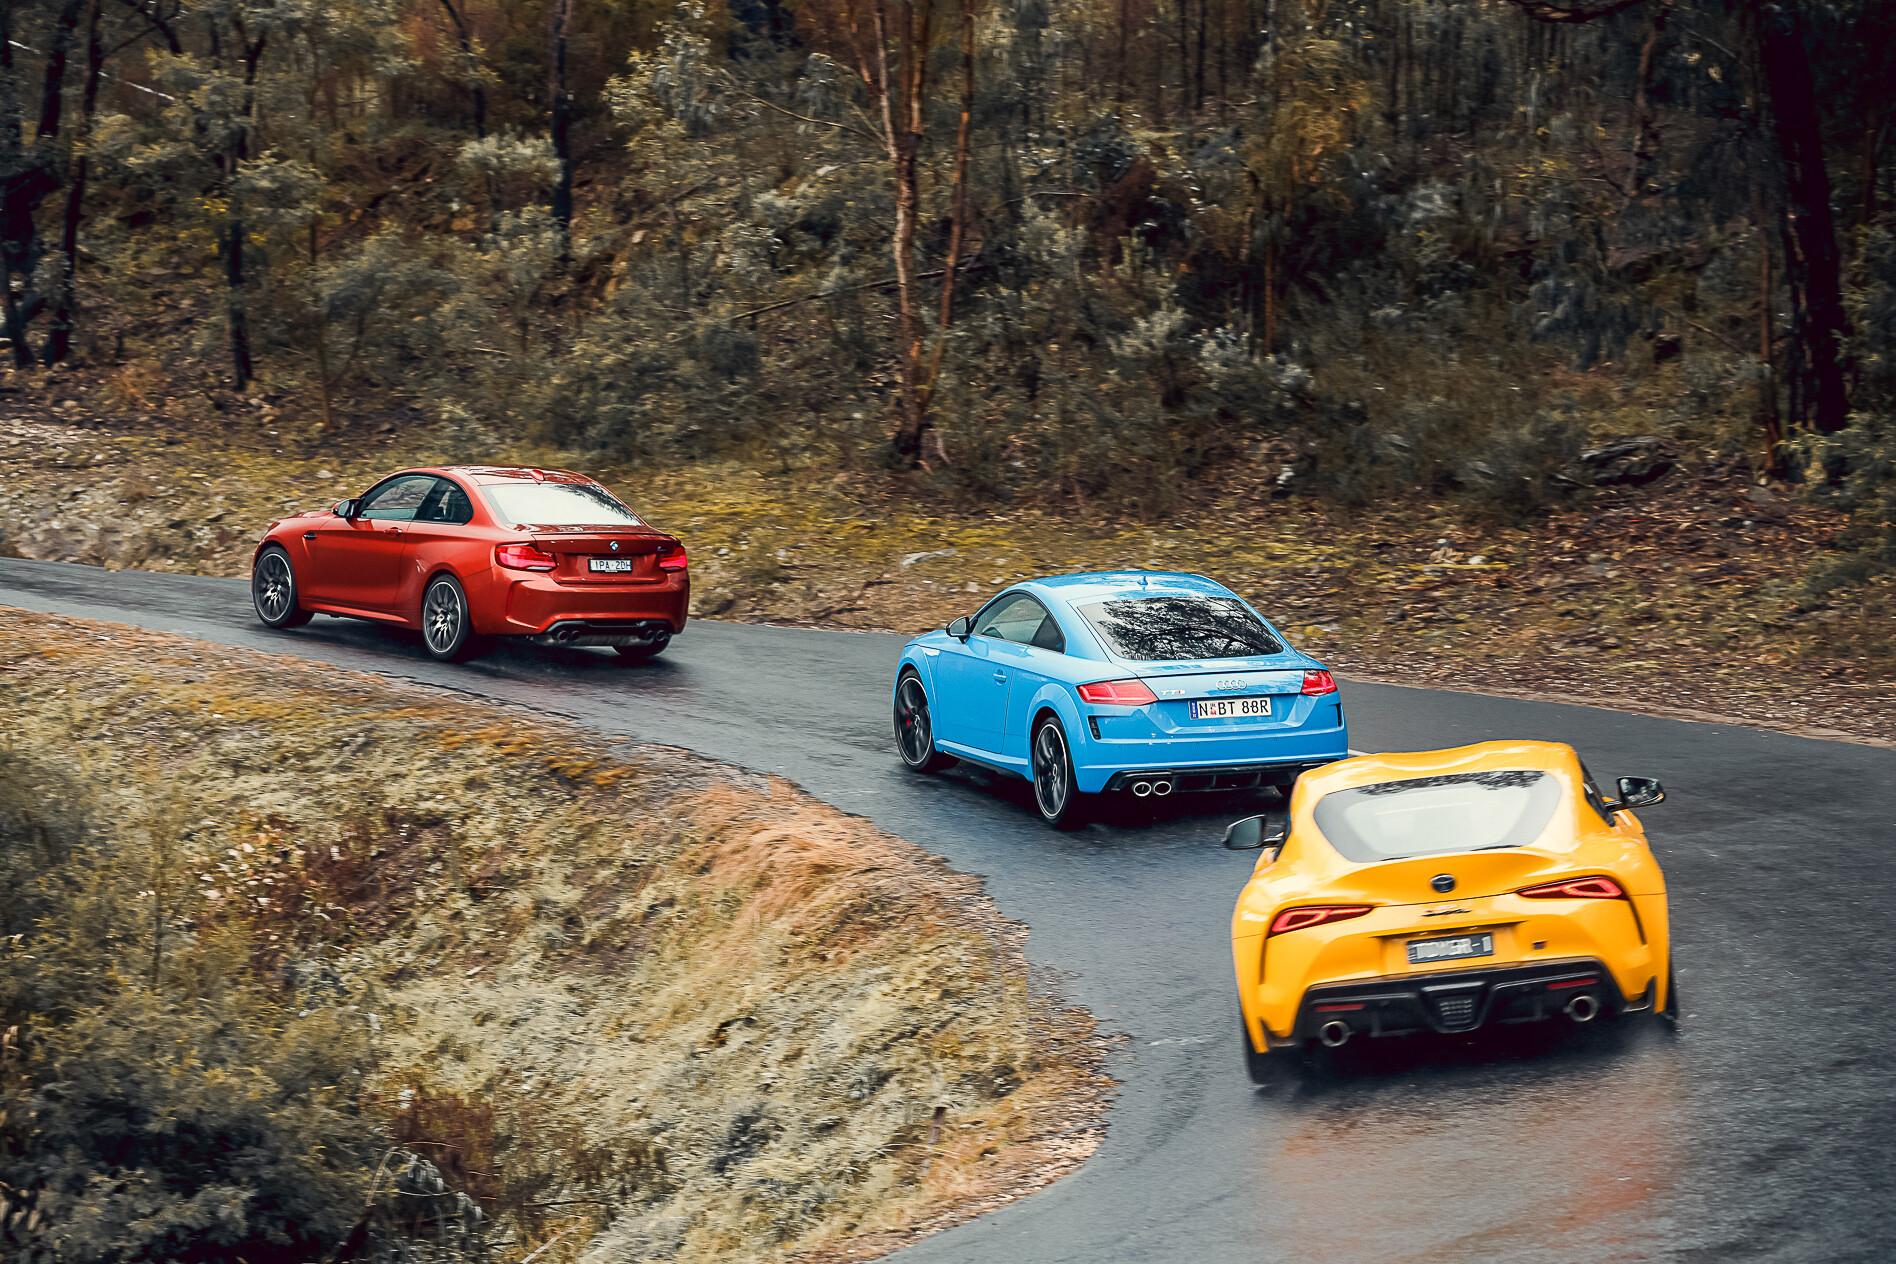 Toyota Supra vs BMW M2 vs Audi TT comparison review